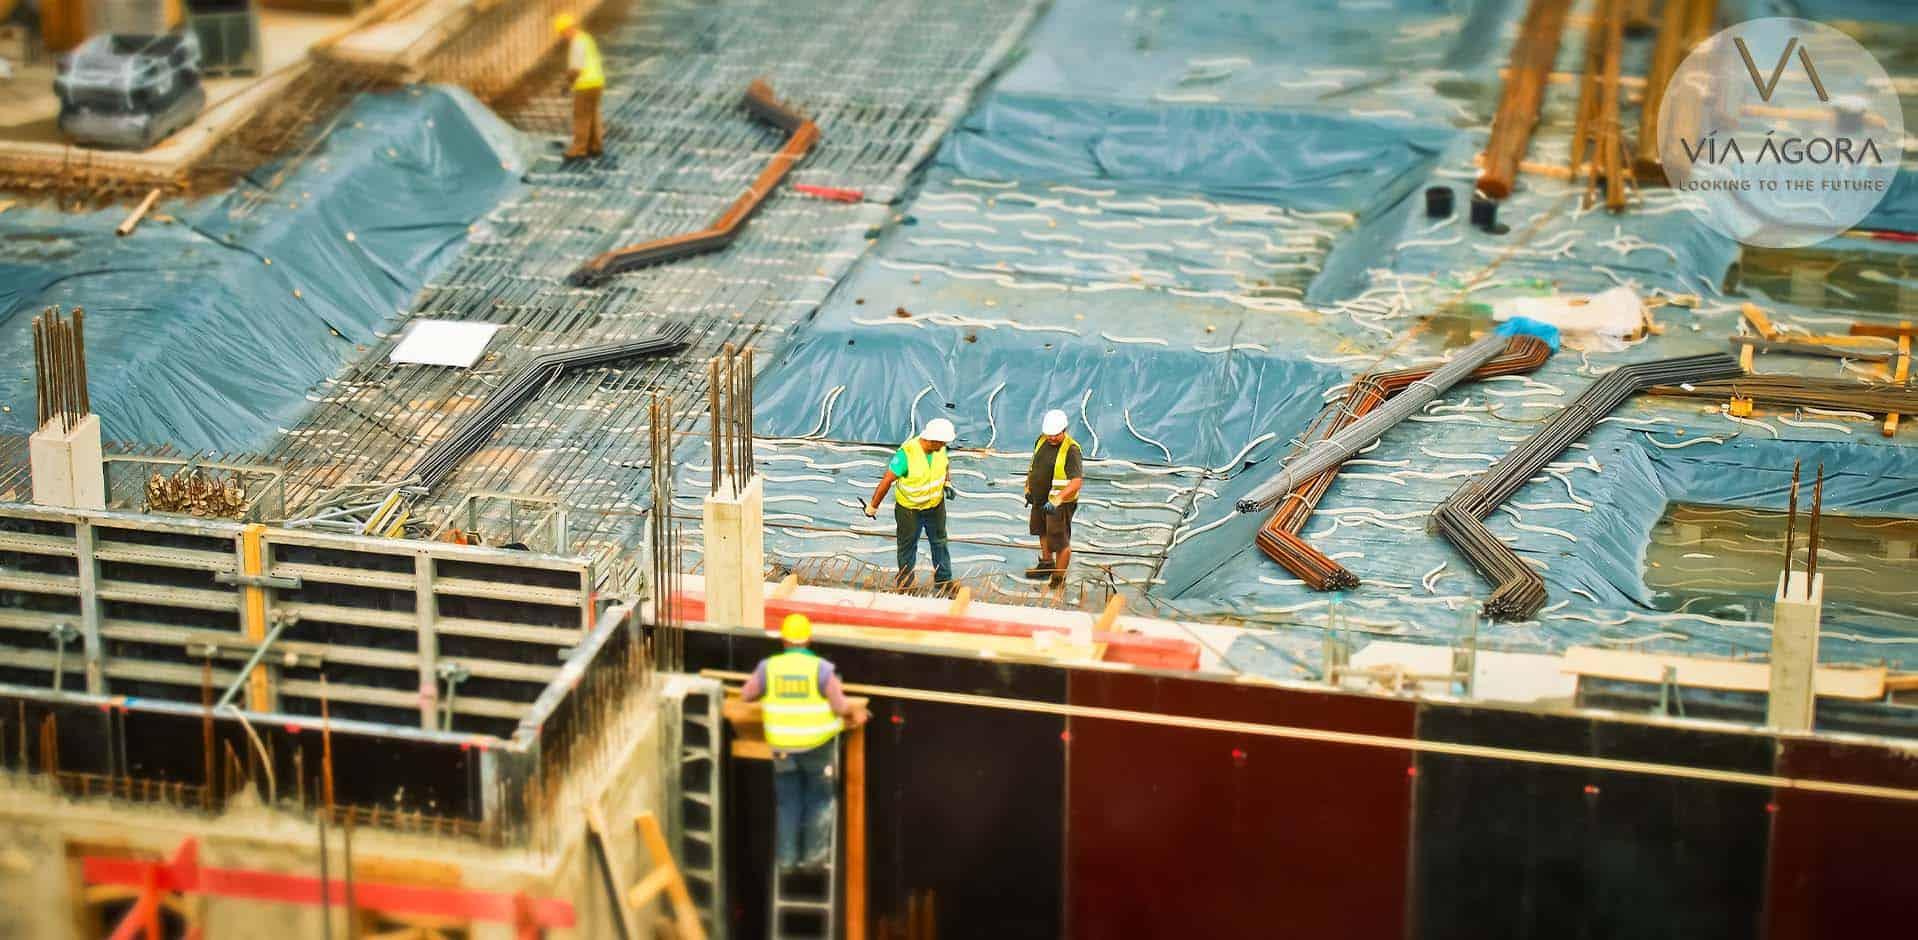 via agora - promotora inmobiliaria - cascos de construcción - 2